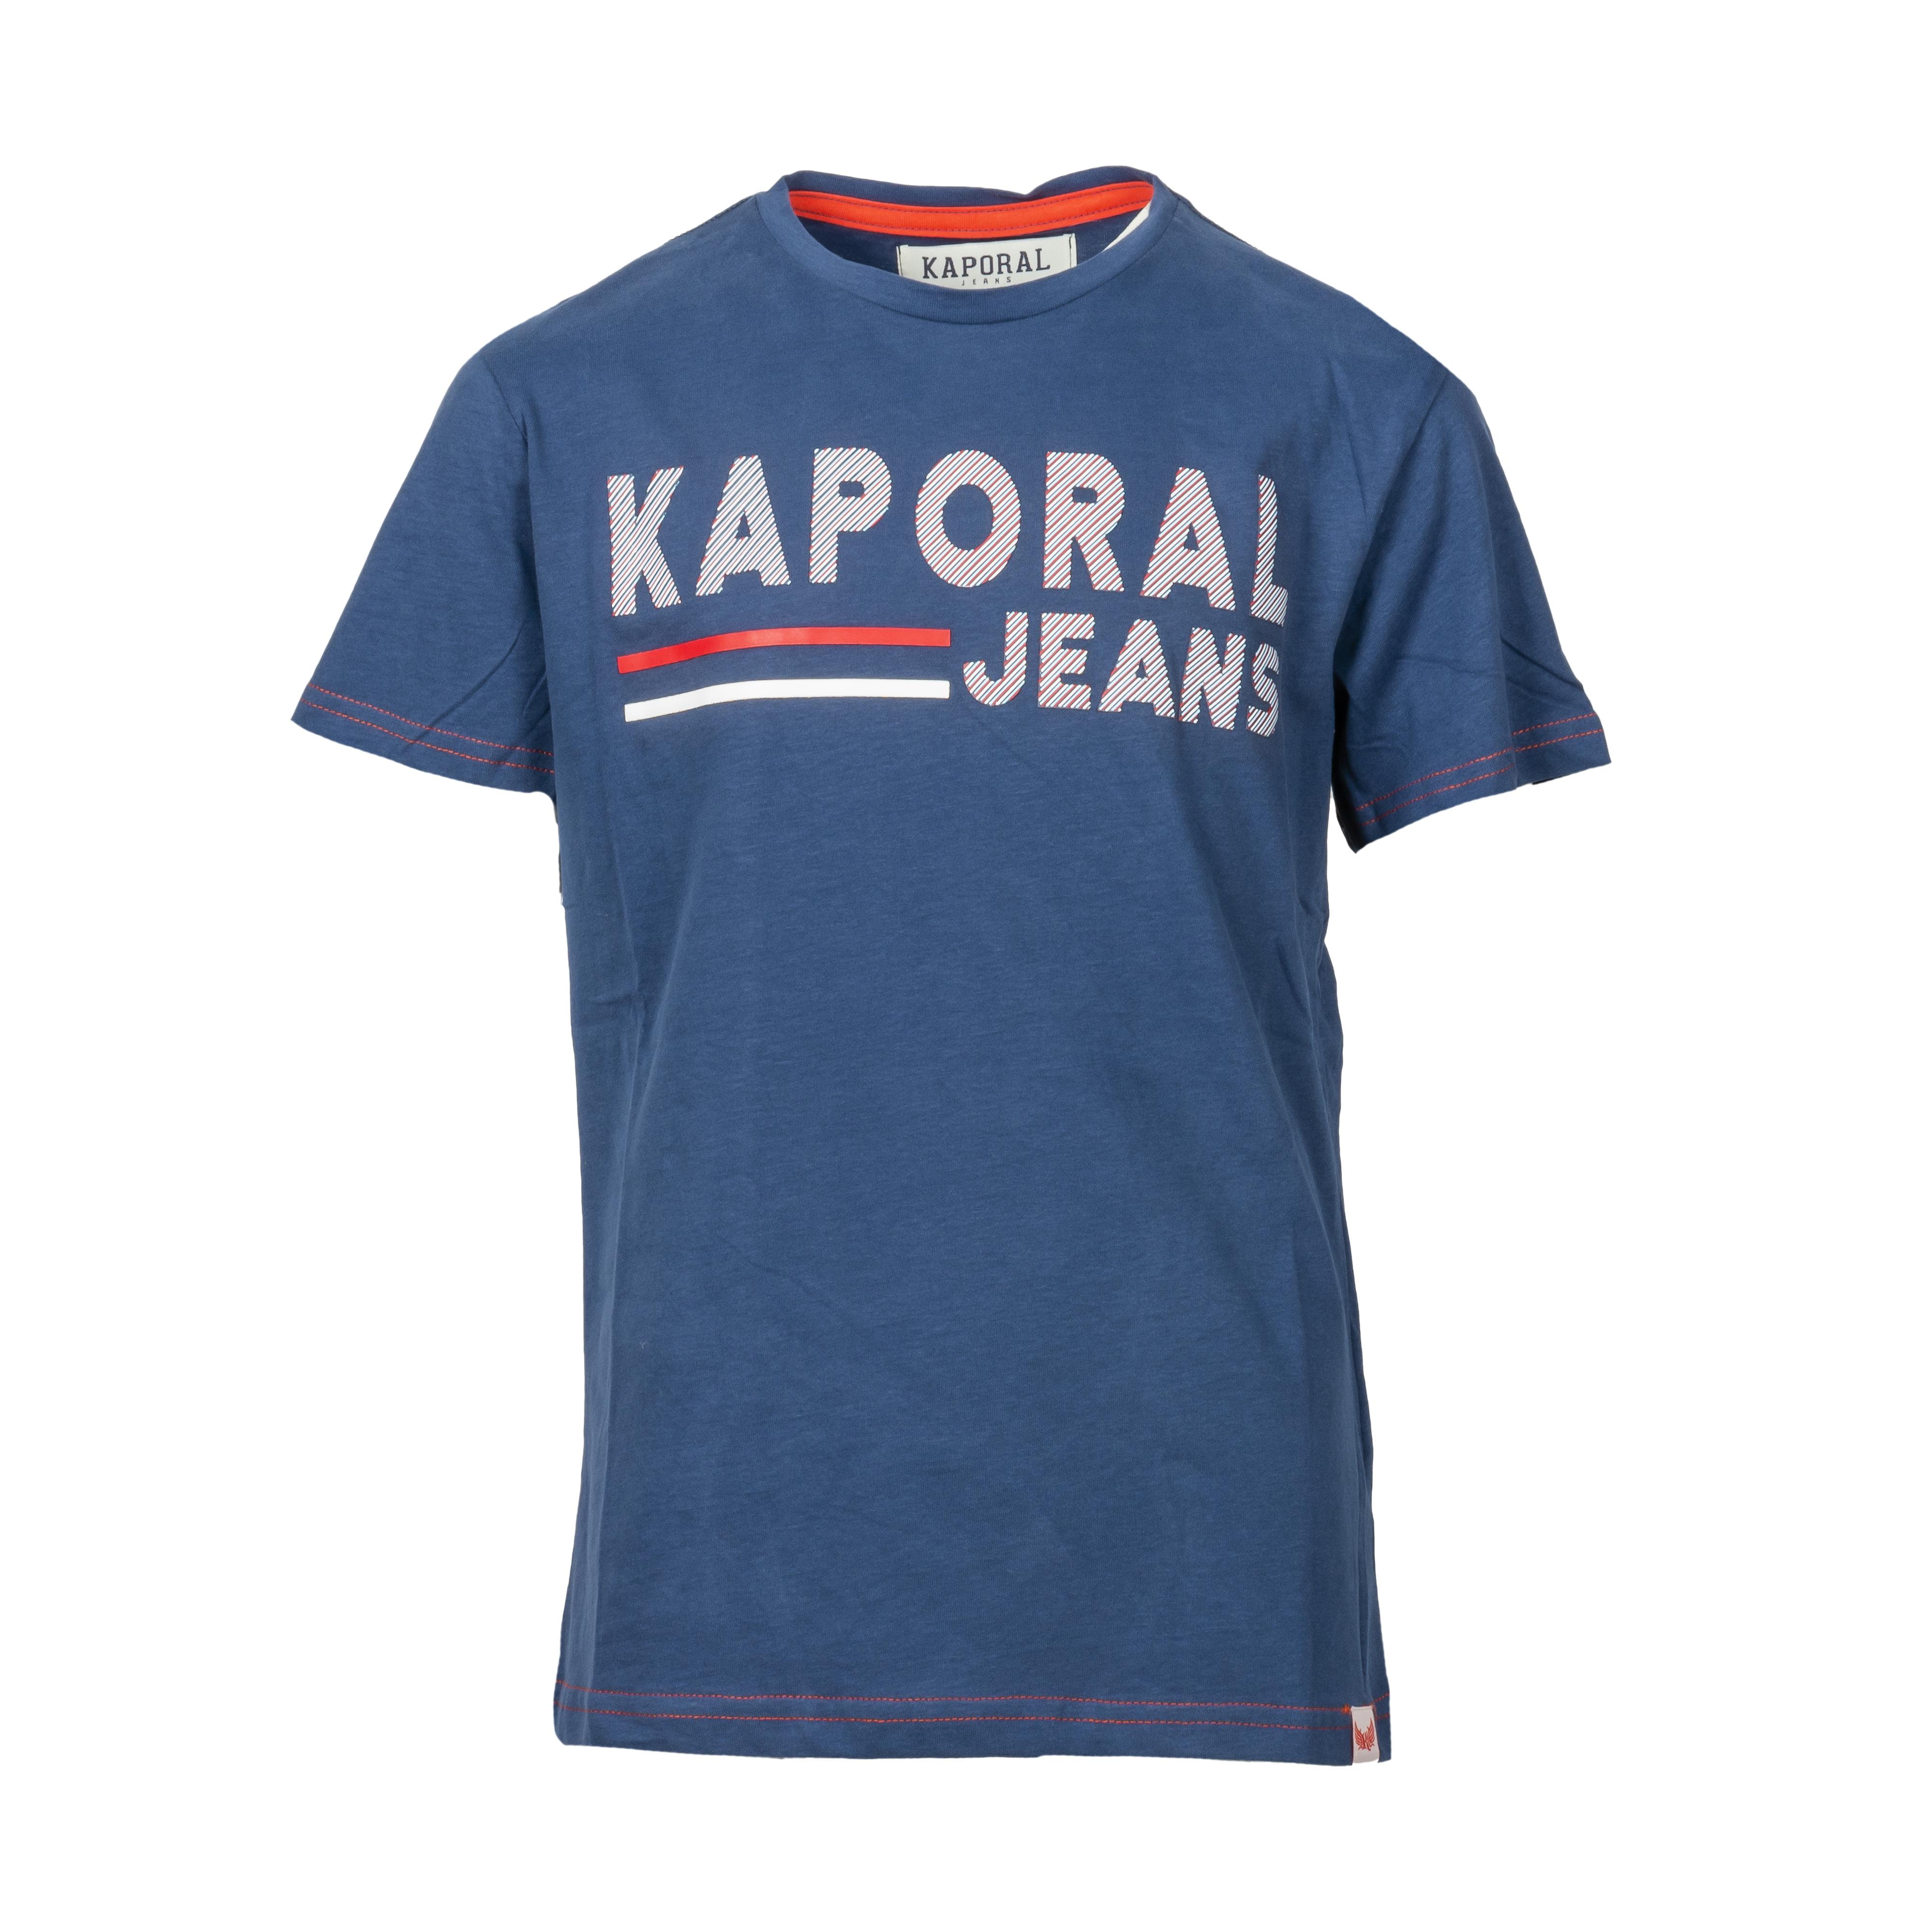 Tee-shirt col rond kaporal ezio en coton bleu imprimé